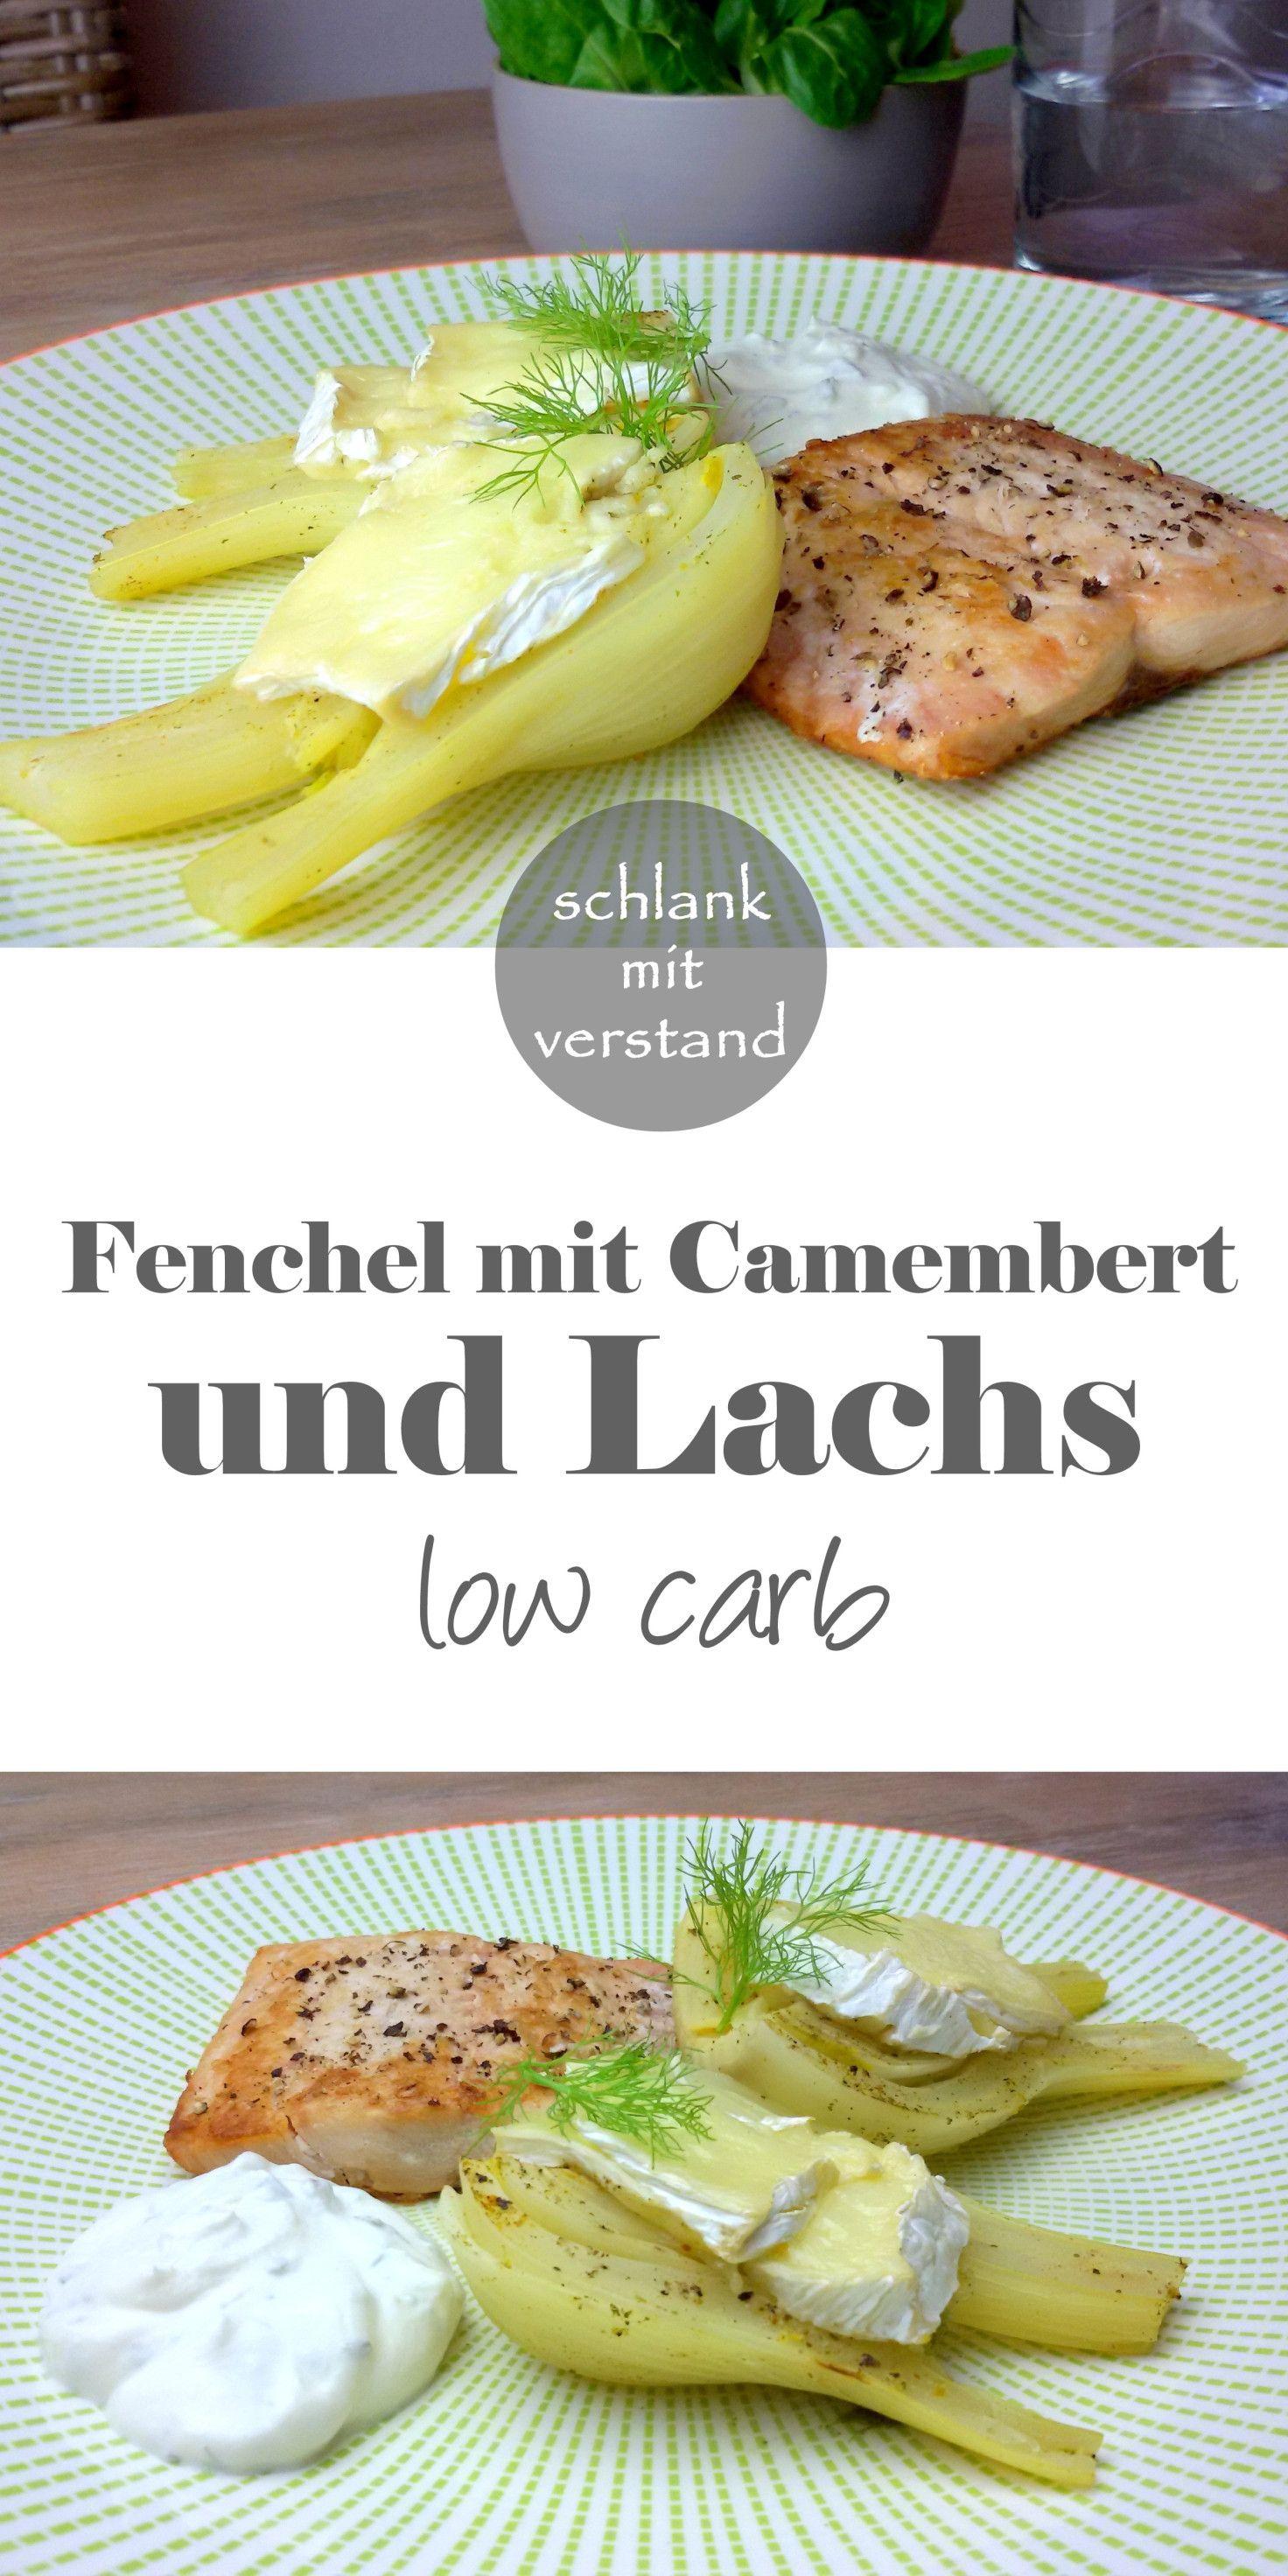 Fenchel mit Camembert und Lachs low carb #lowcarbveggies